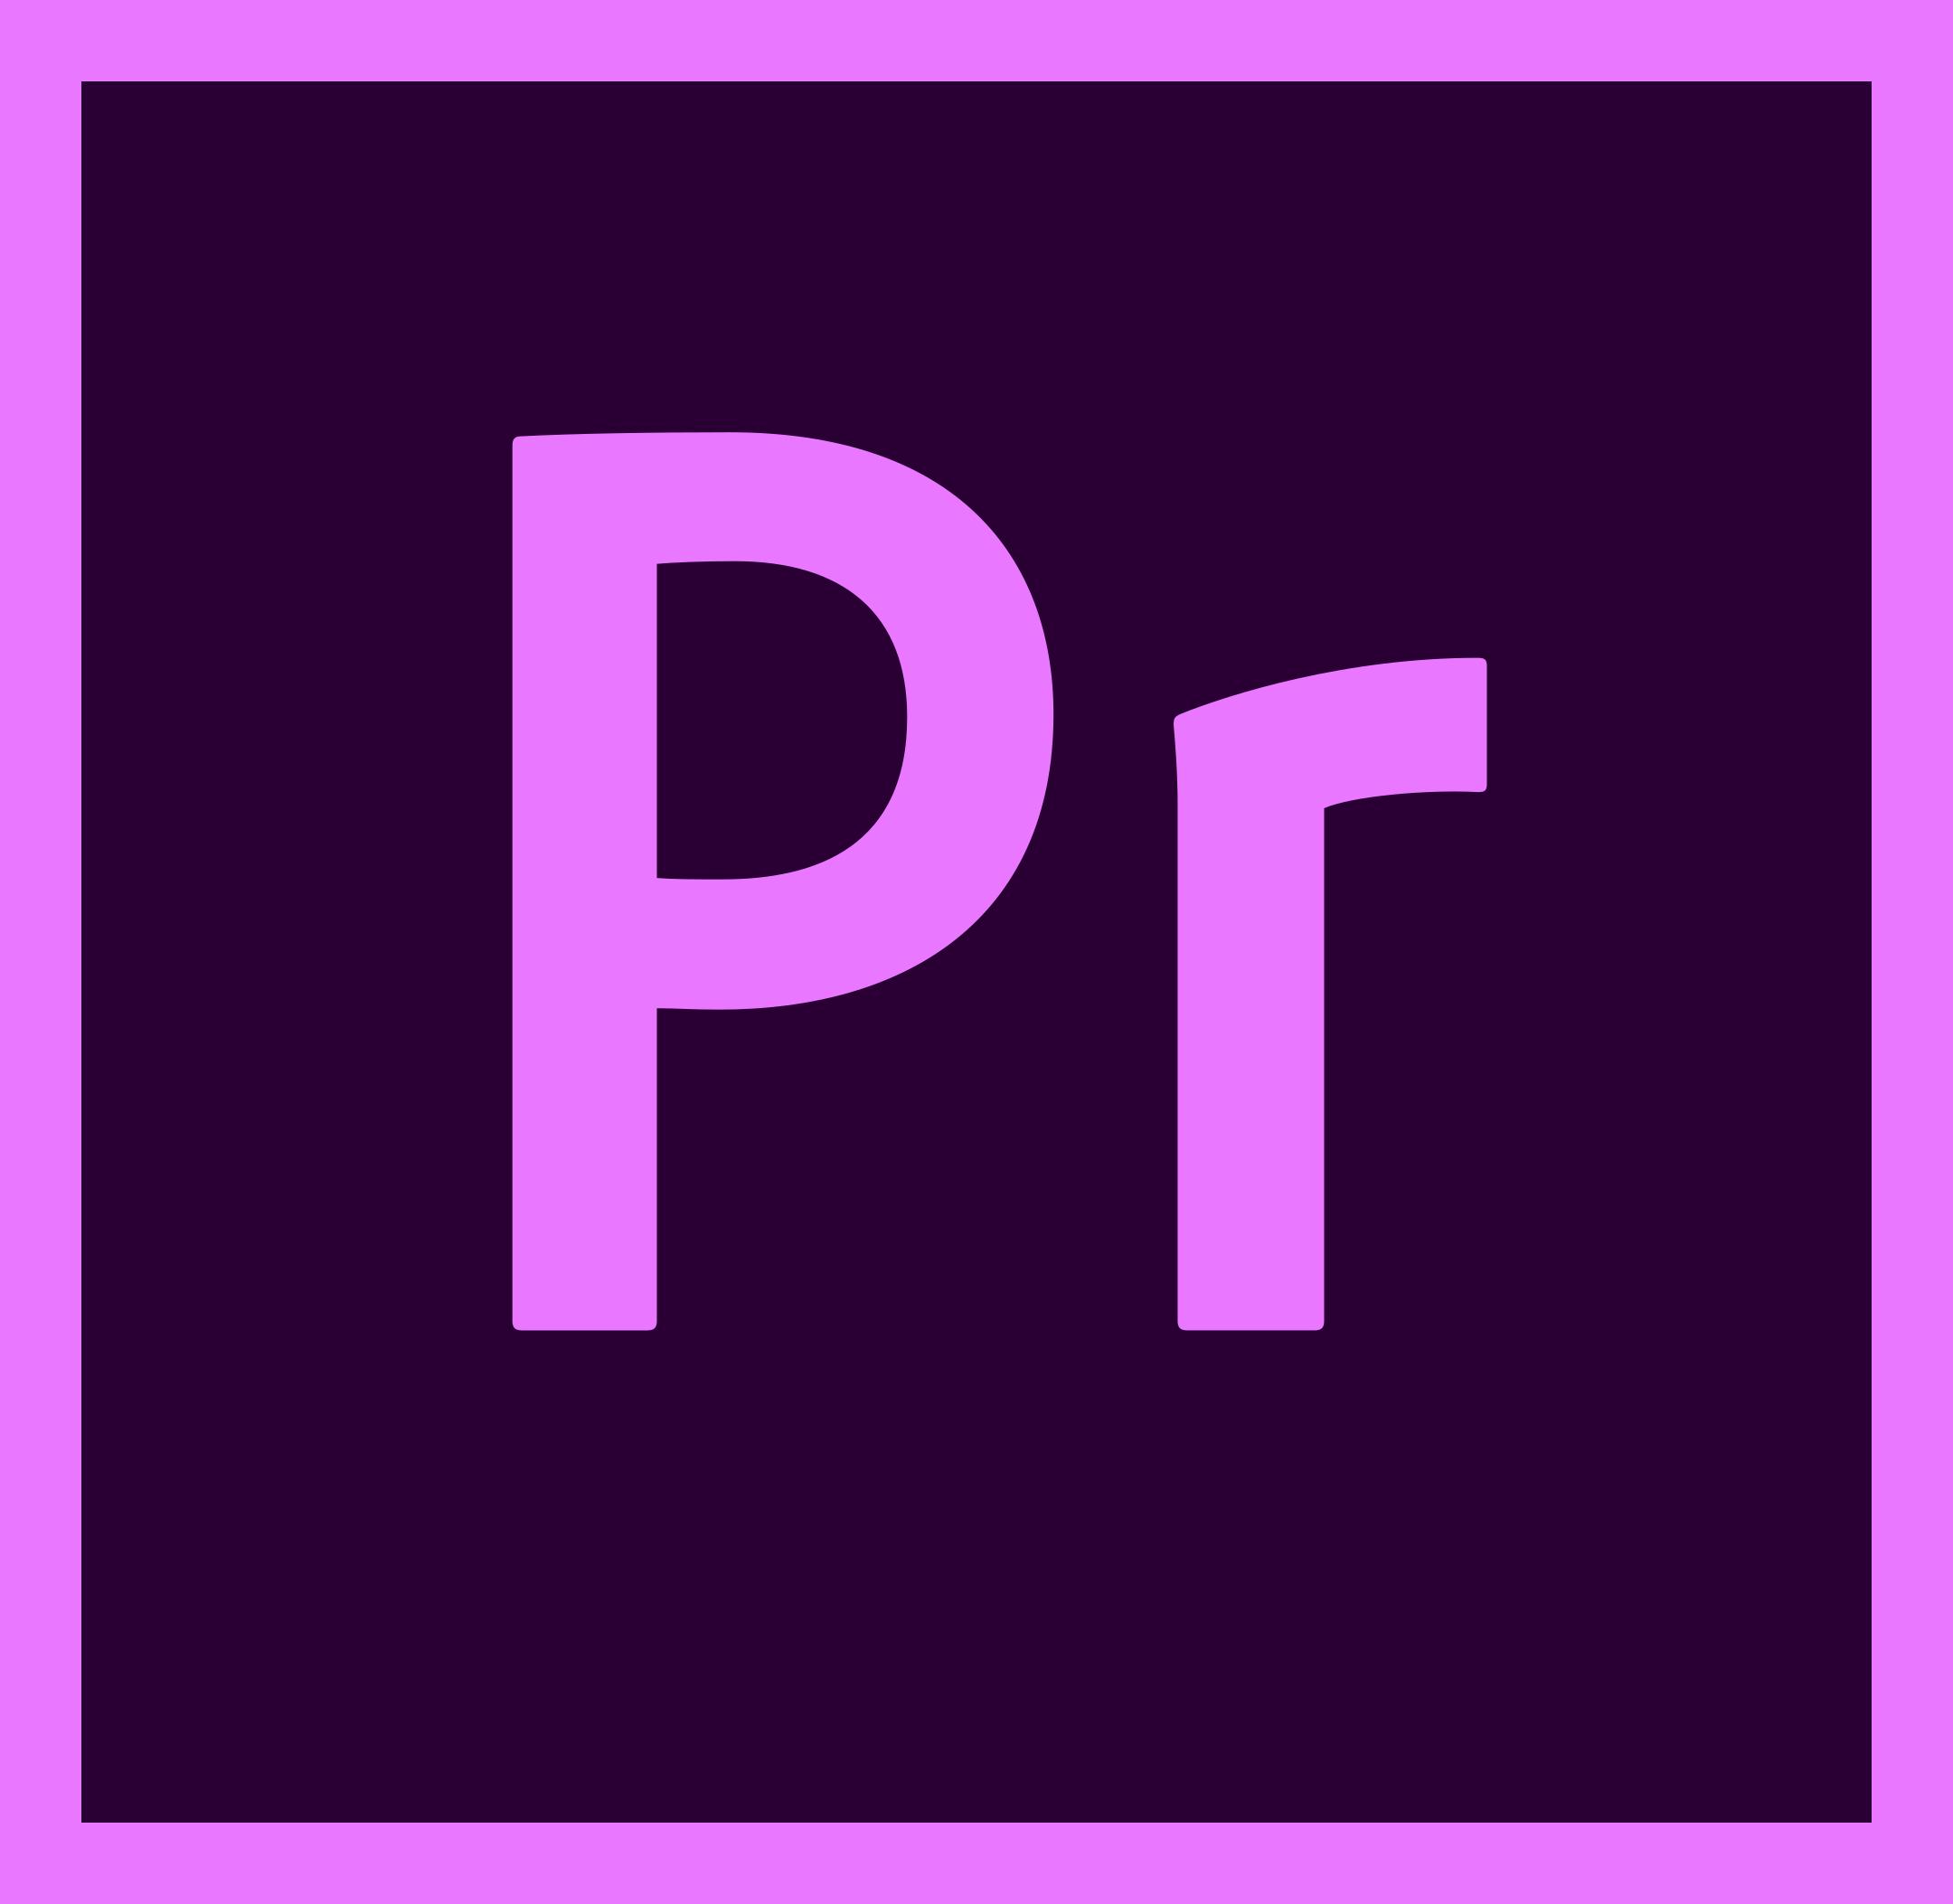 adobe premiere pro logo 1 - Adobe Premiere Pro Logo